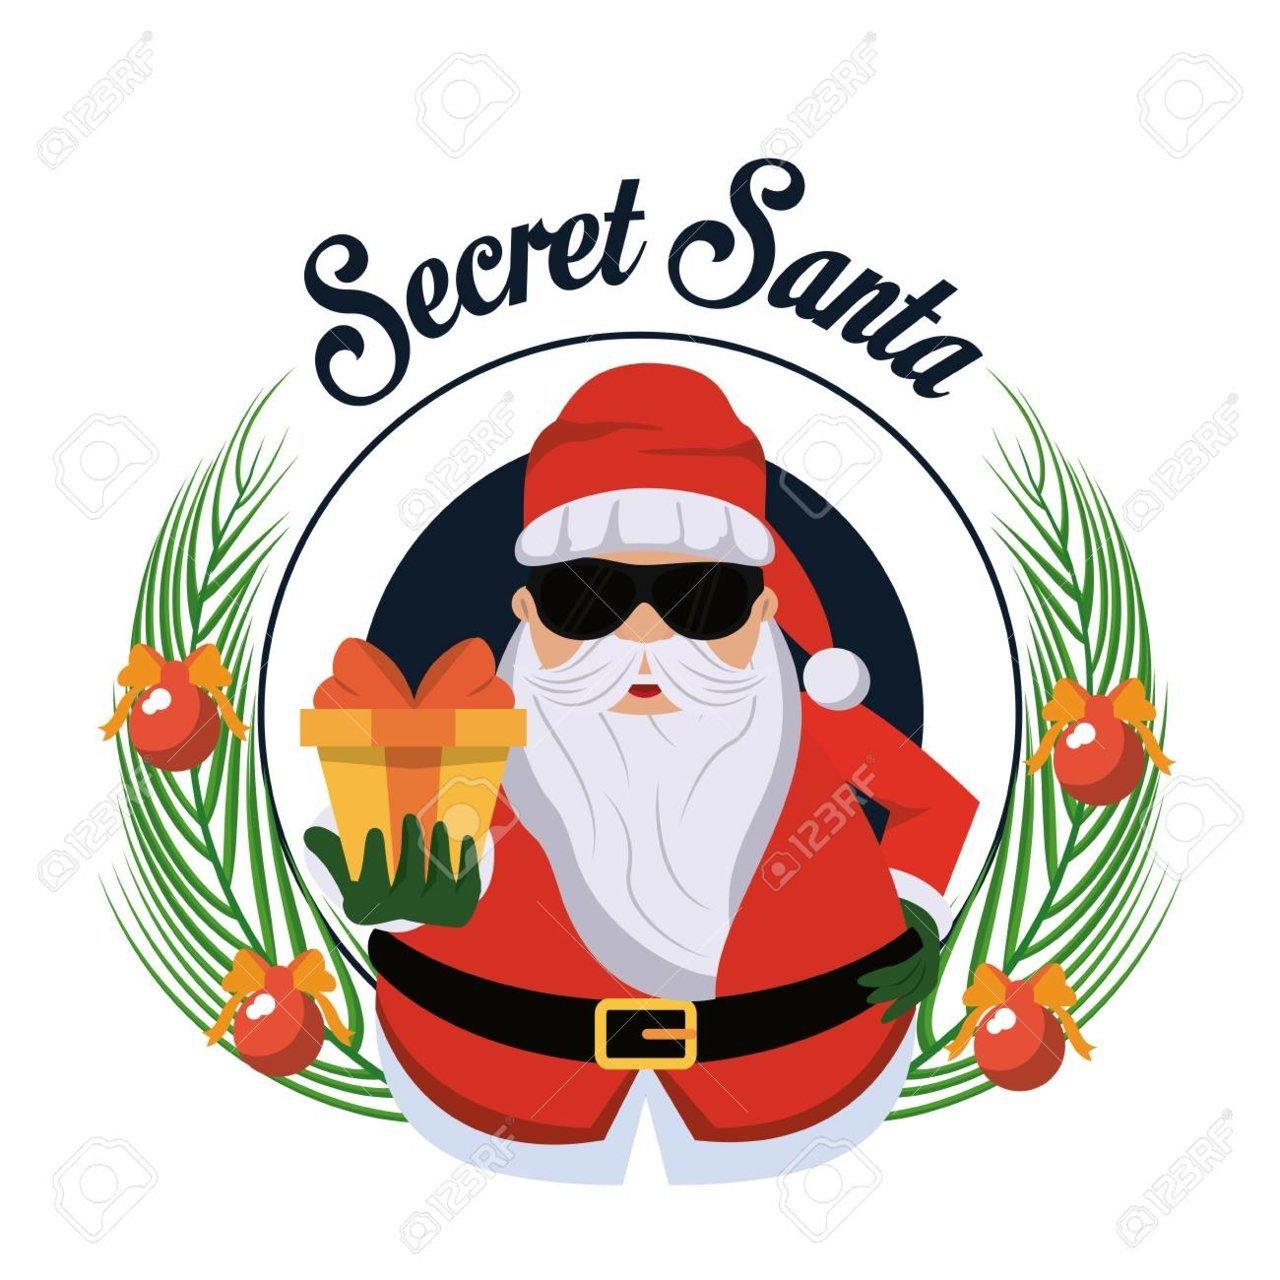 88086625-secret-santa-cartoon-icon-vector-illustration-graphic-design.jpg